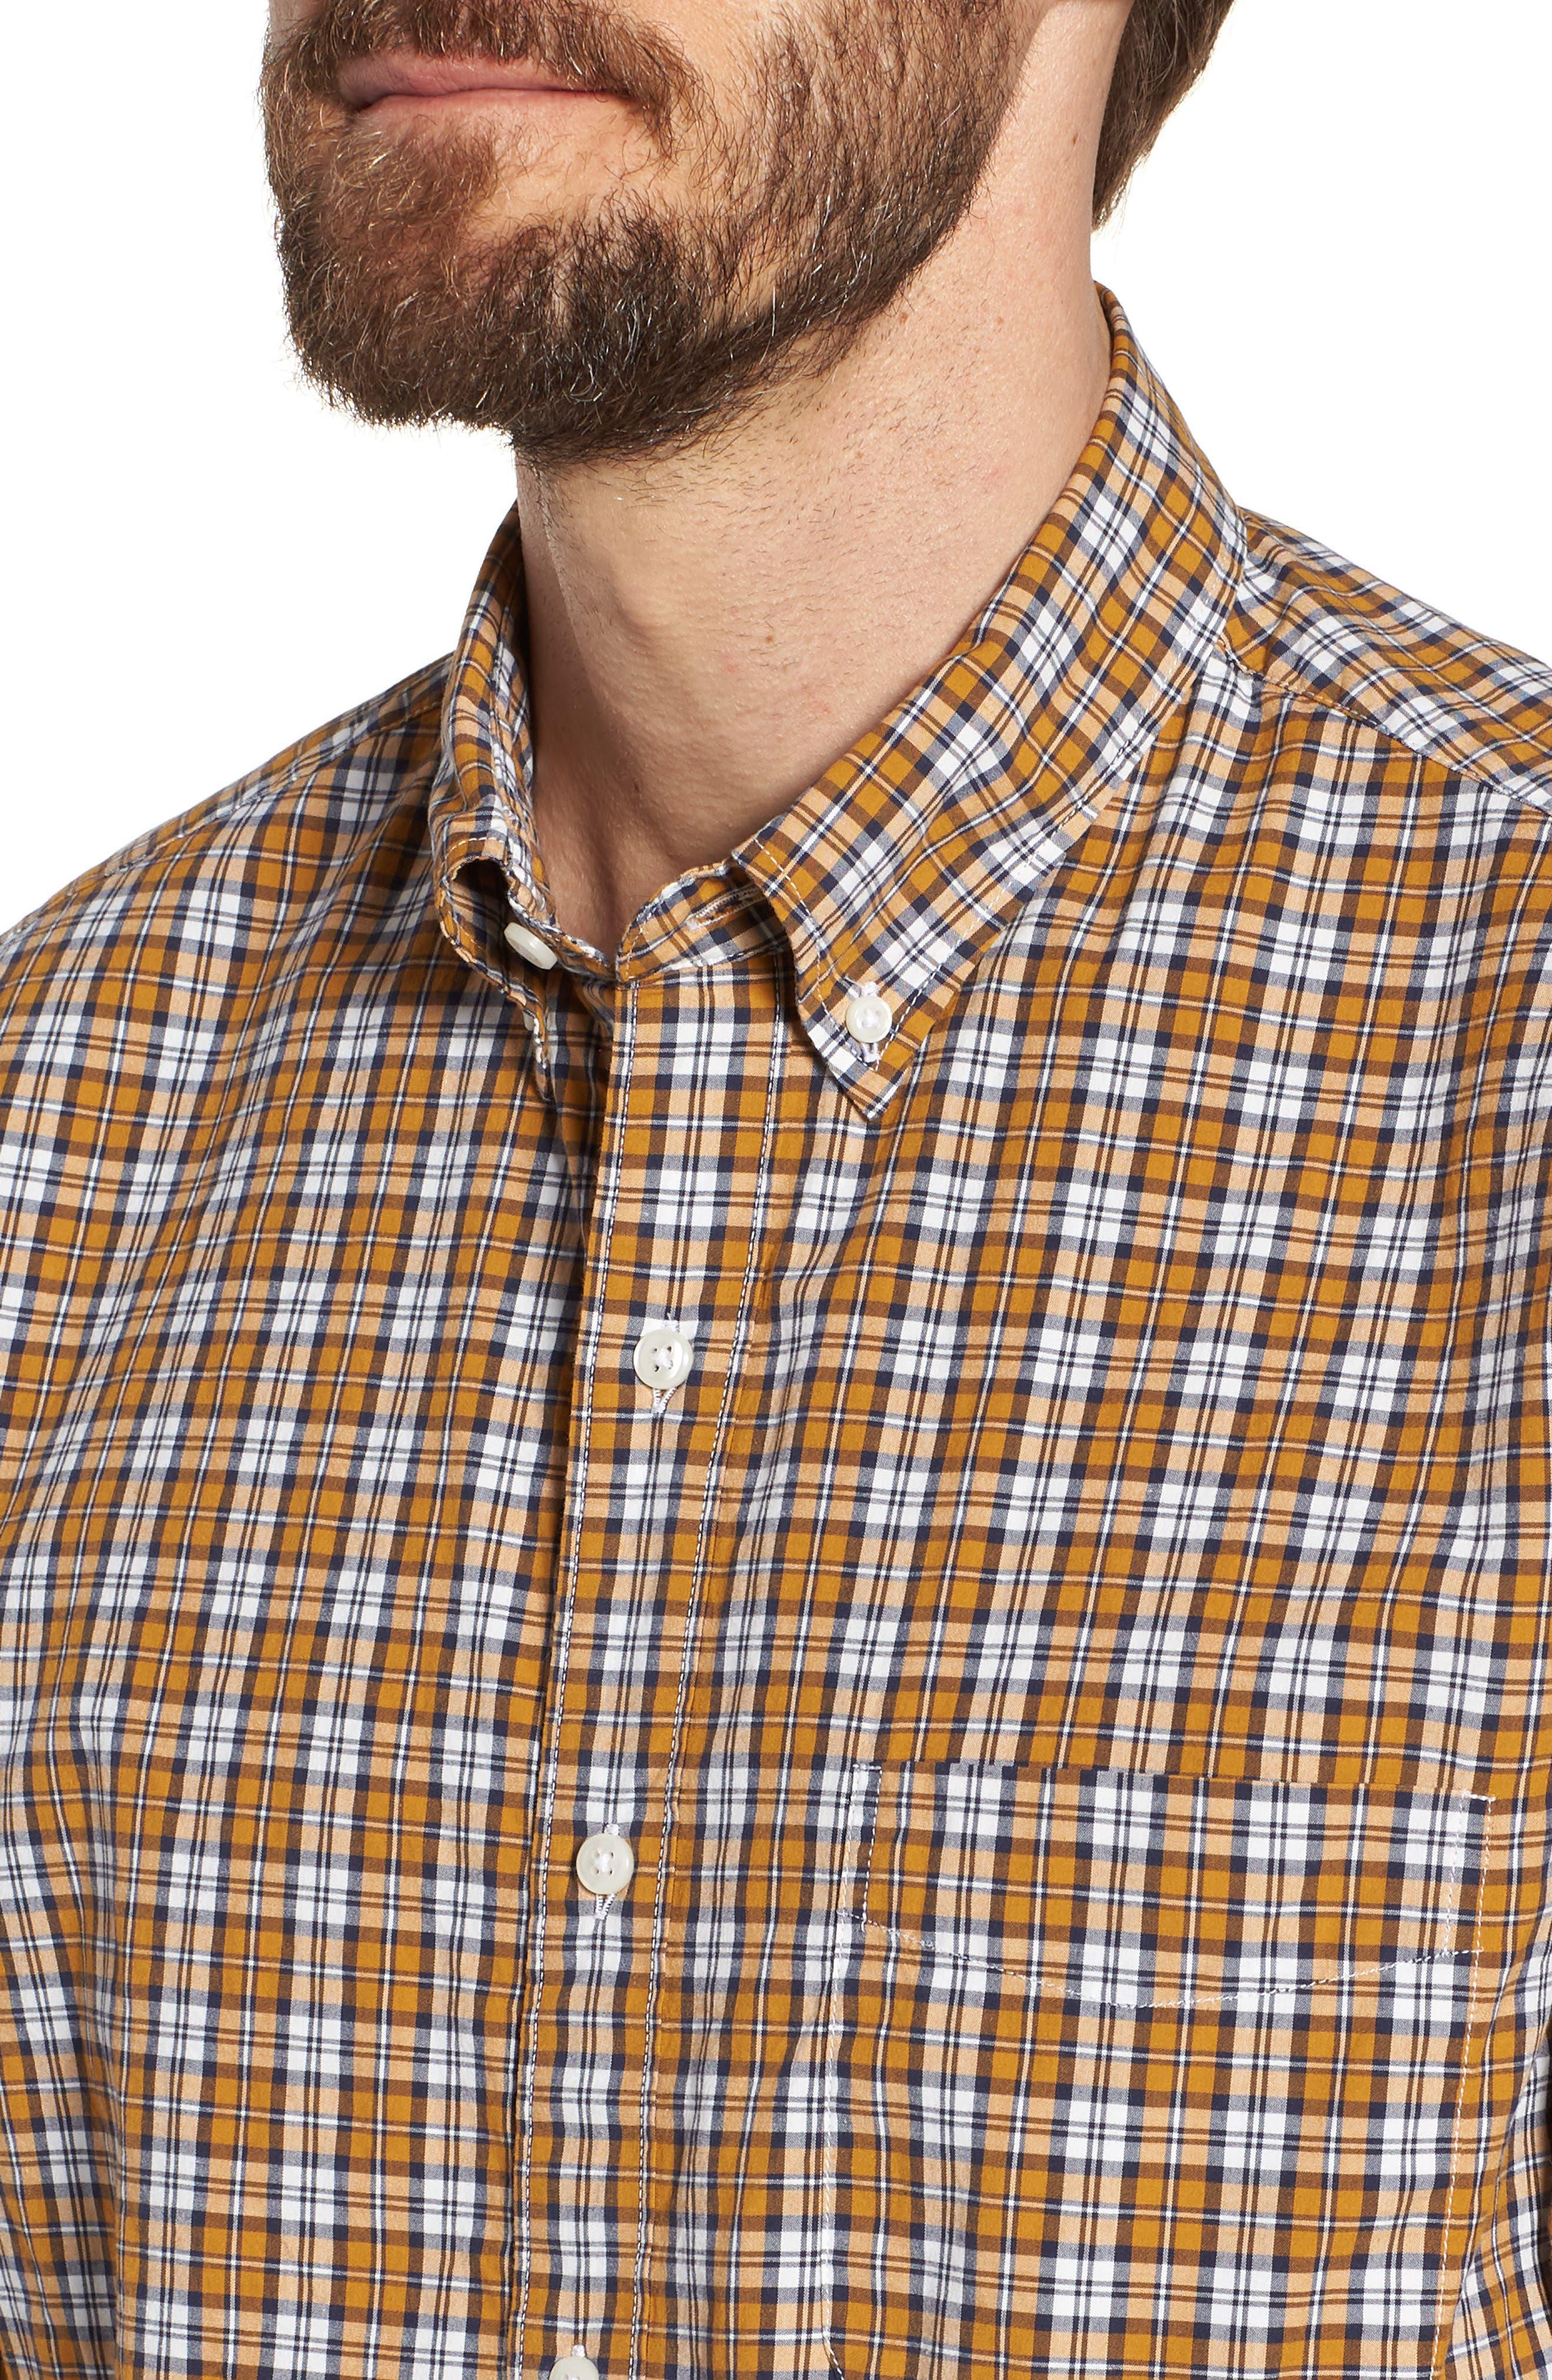 J.Crew Slim Fit Stretch Secret Wash Plaid Sport Shirt,                             Alternate thumbnail 4, color,                             Warm Cider